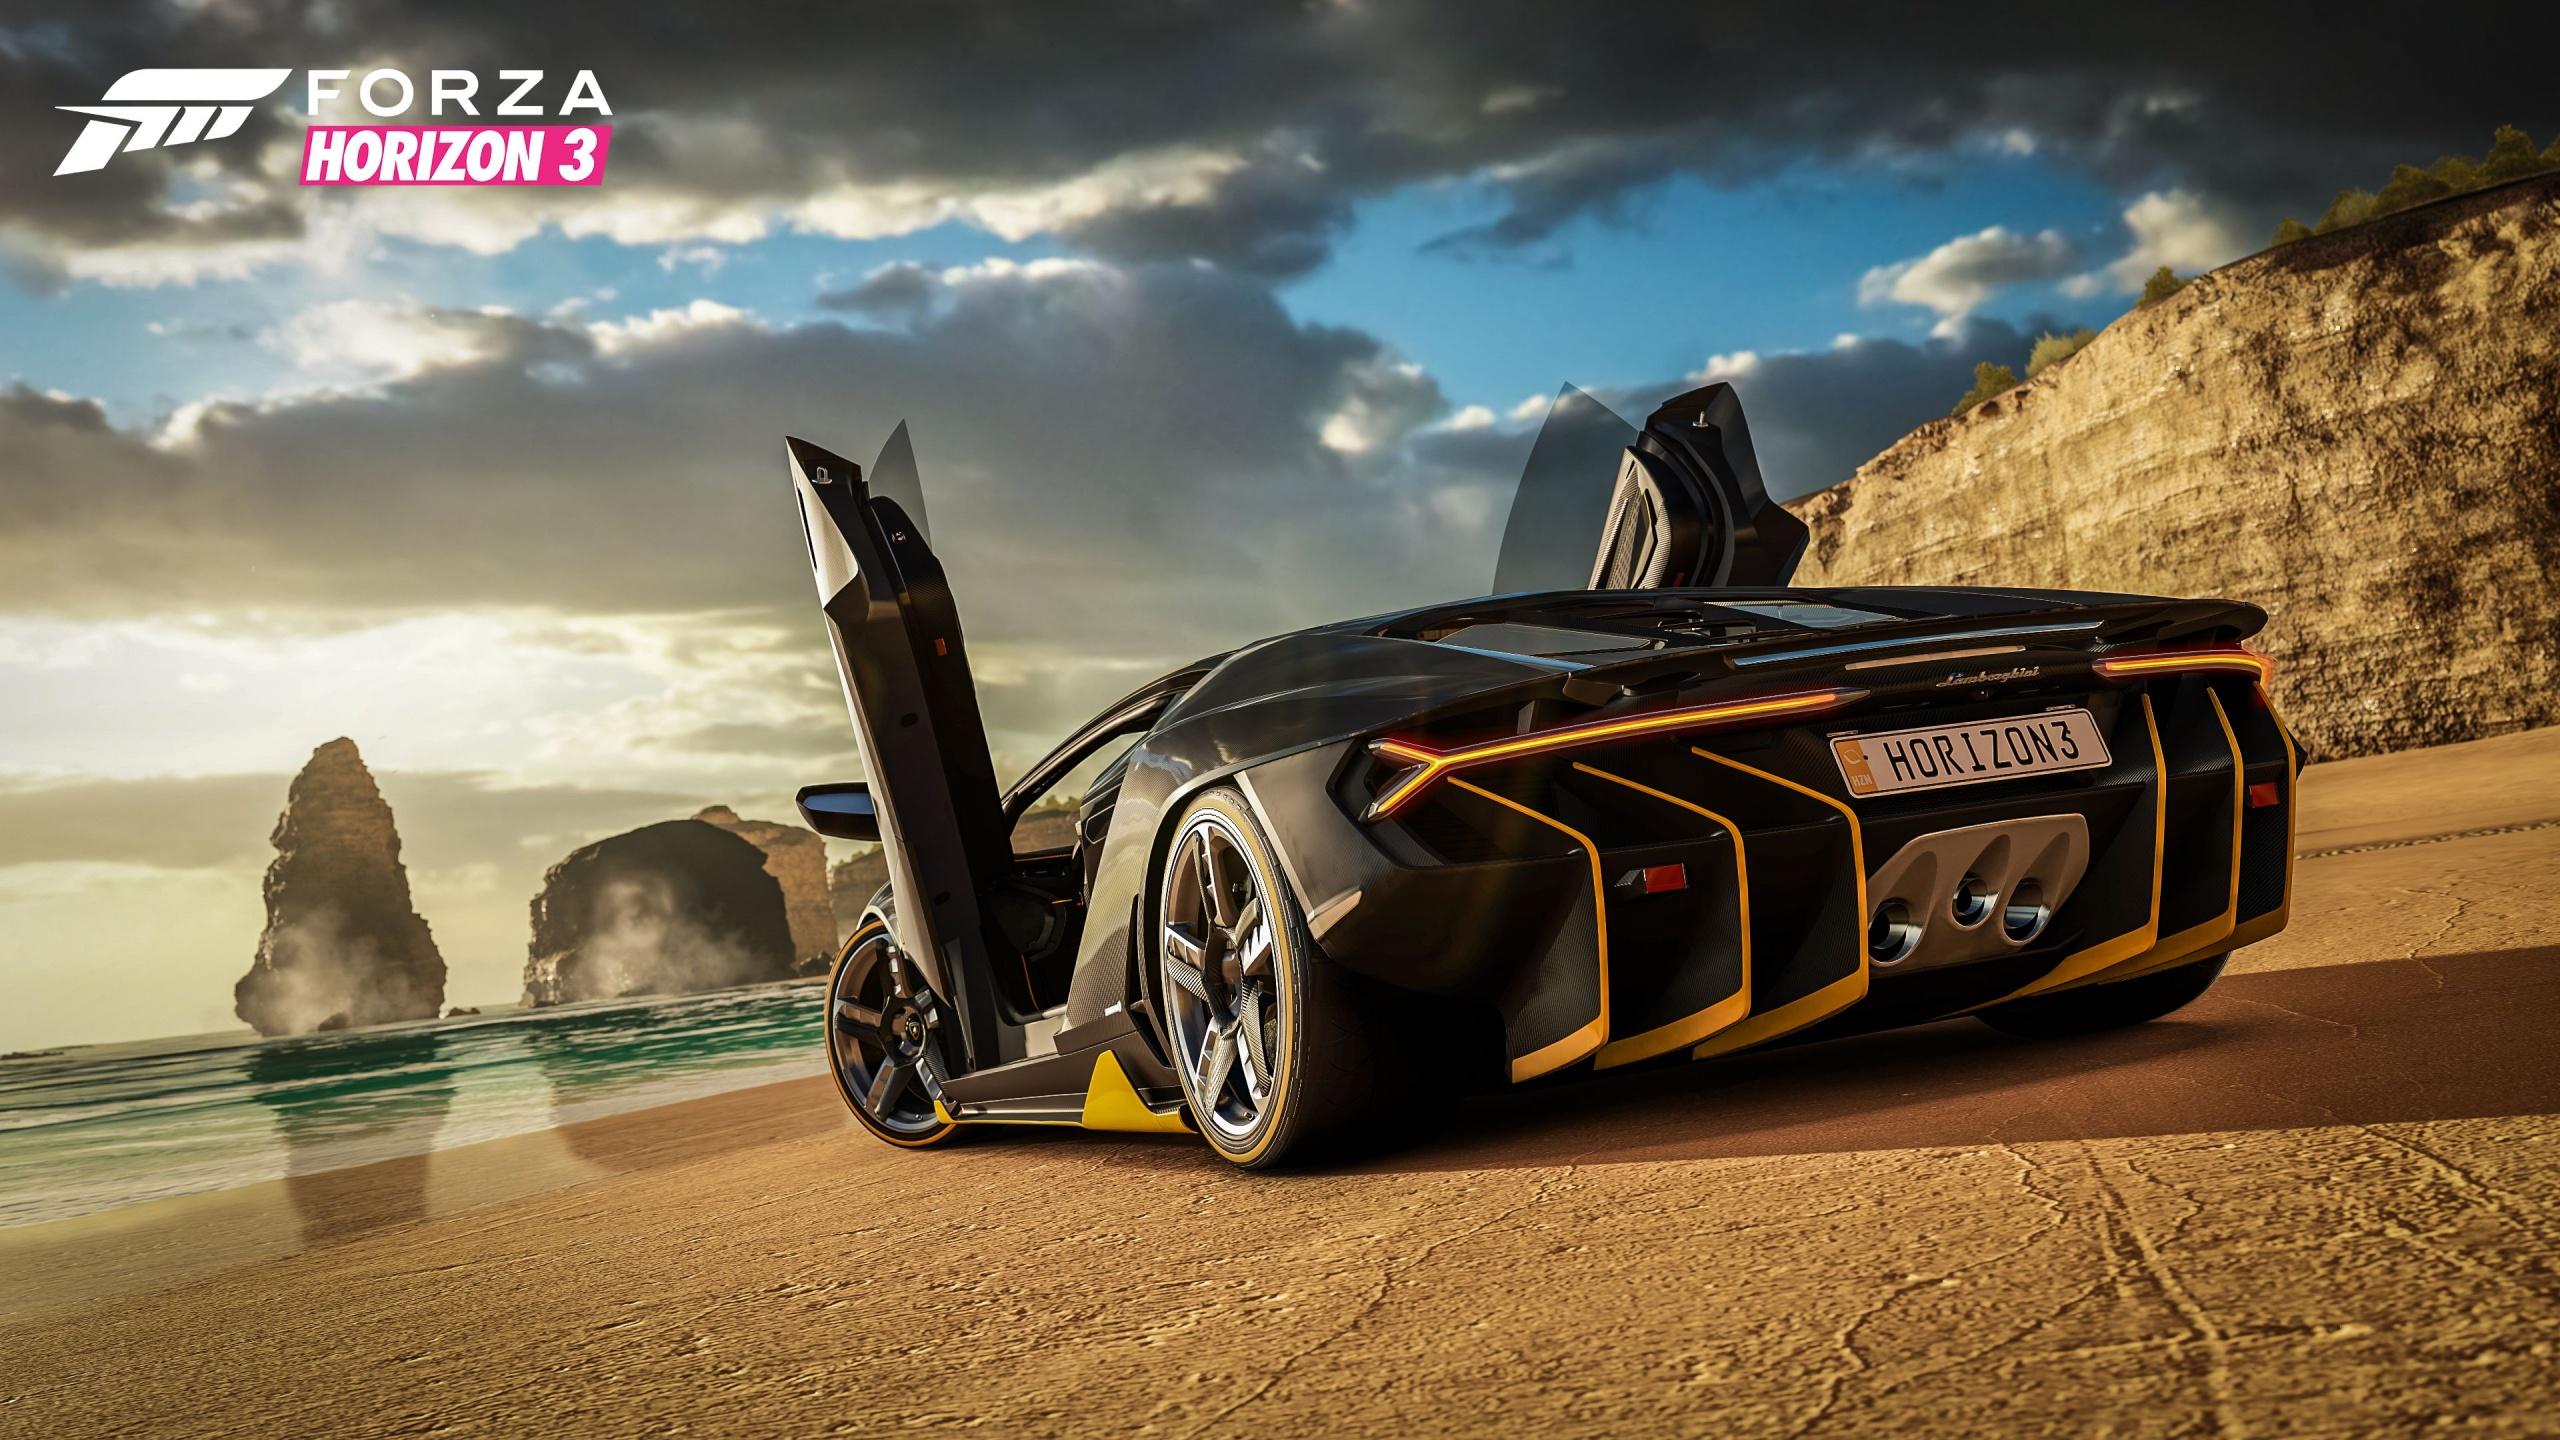 Forza Horizon 3 a 4K en Xbox One X